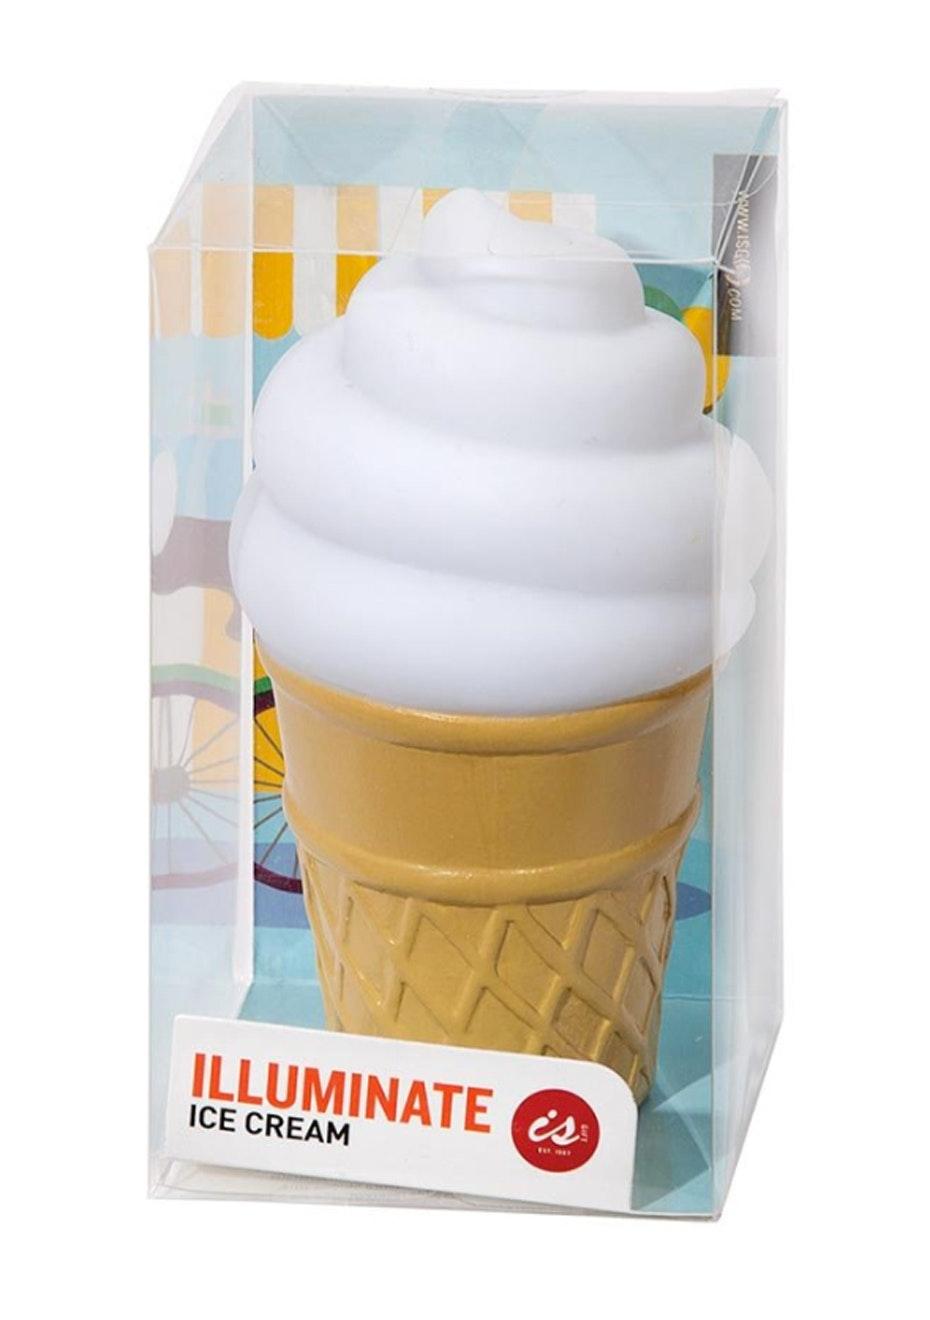 Illuminate - Ice Cream LED Light